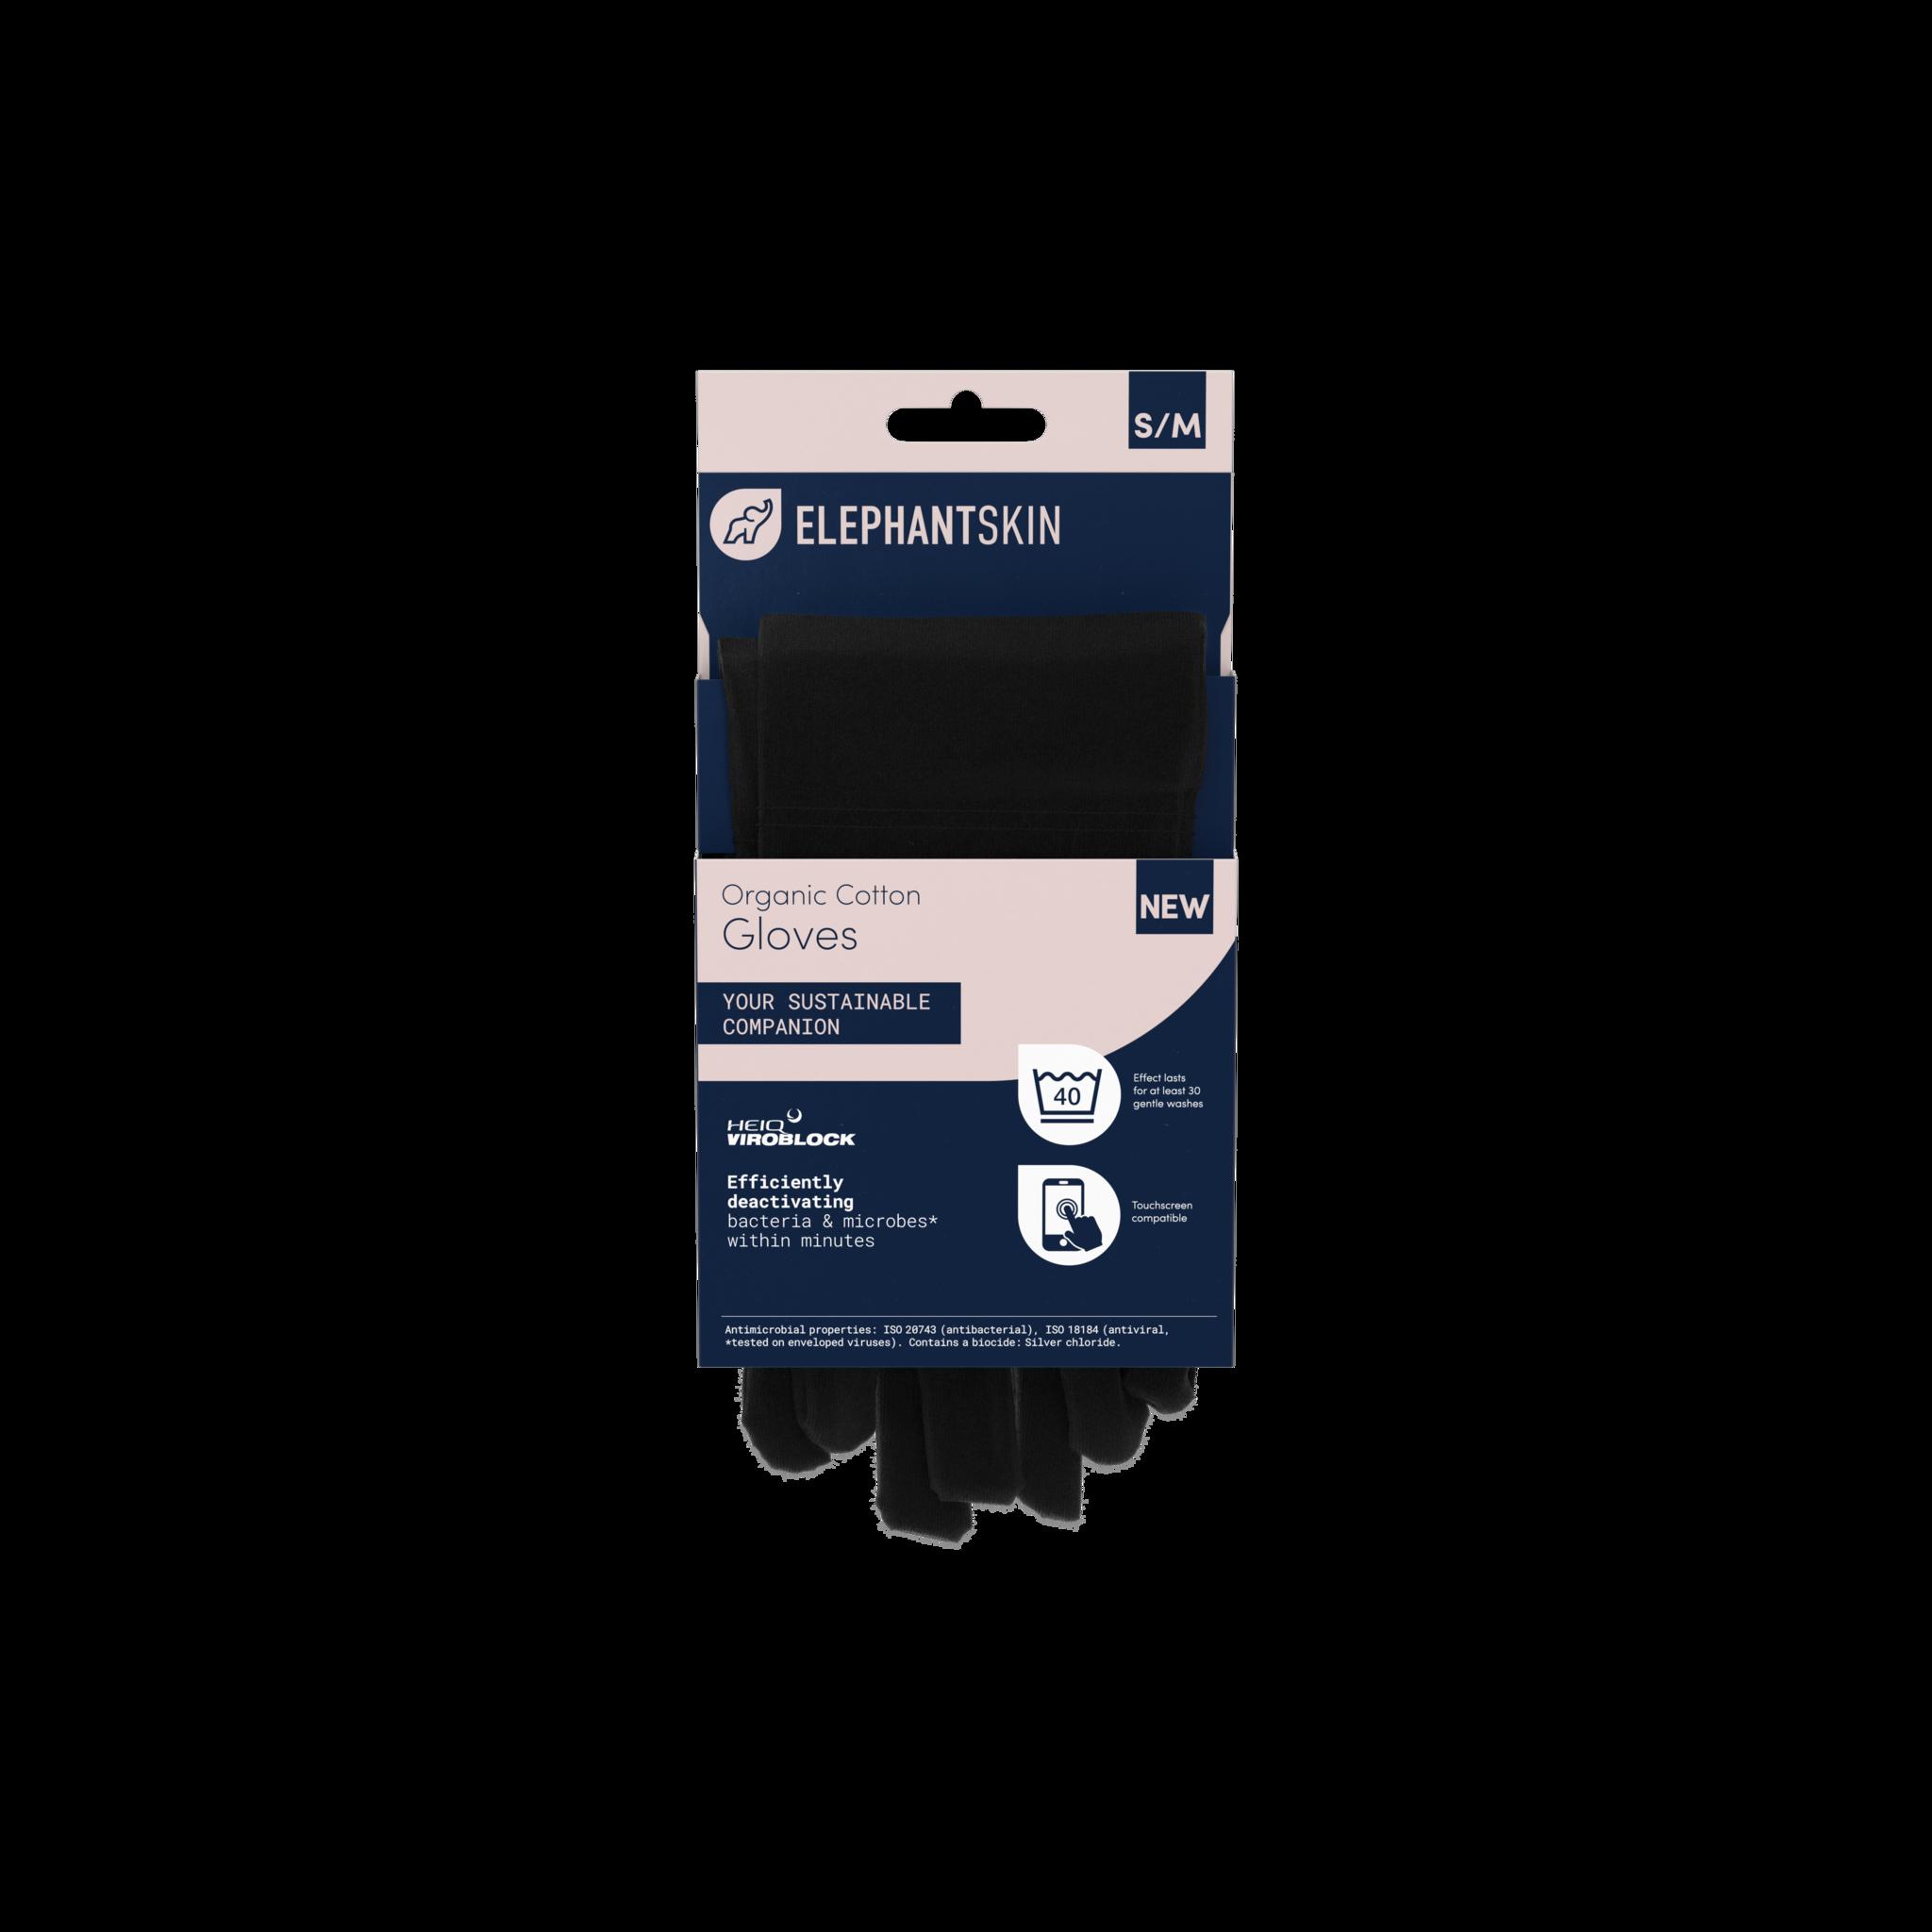 ElephantSkin Black S/M ElephantSkin Reusable Antibacterial and Antiviral Gloves (15 case)